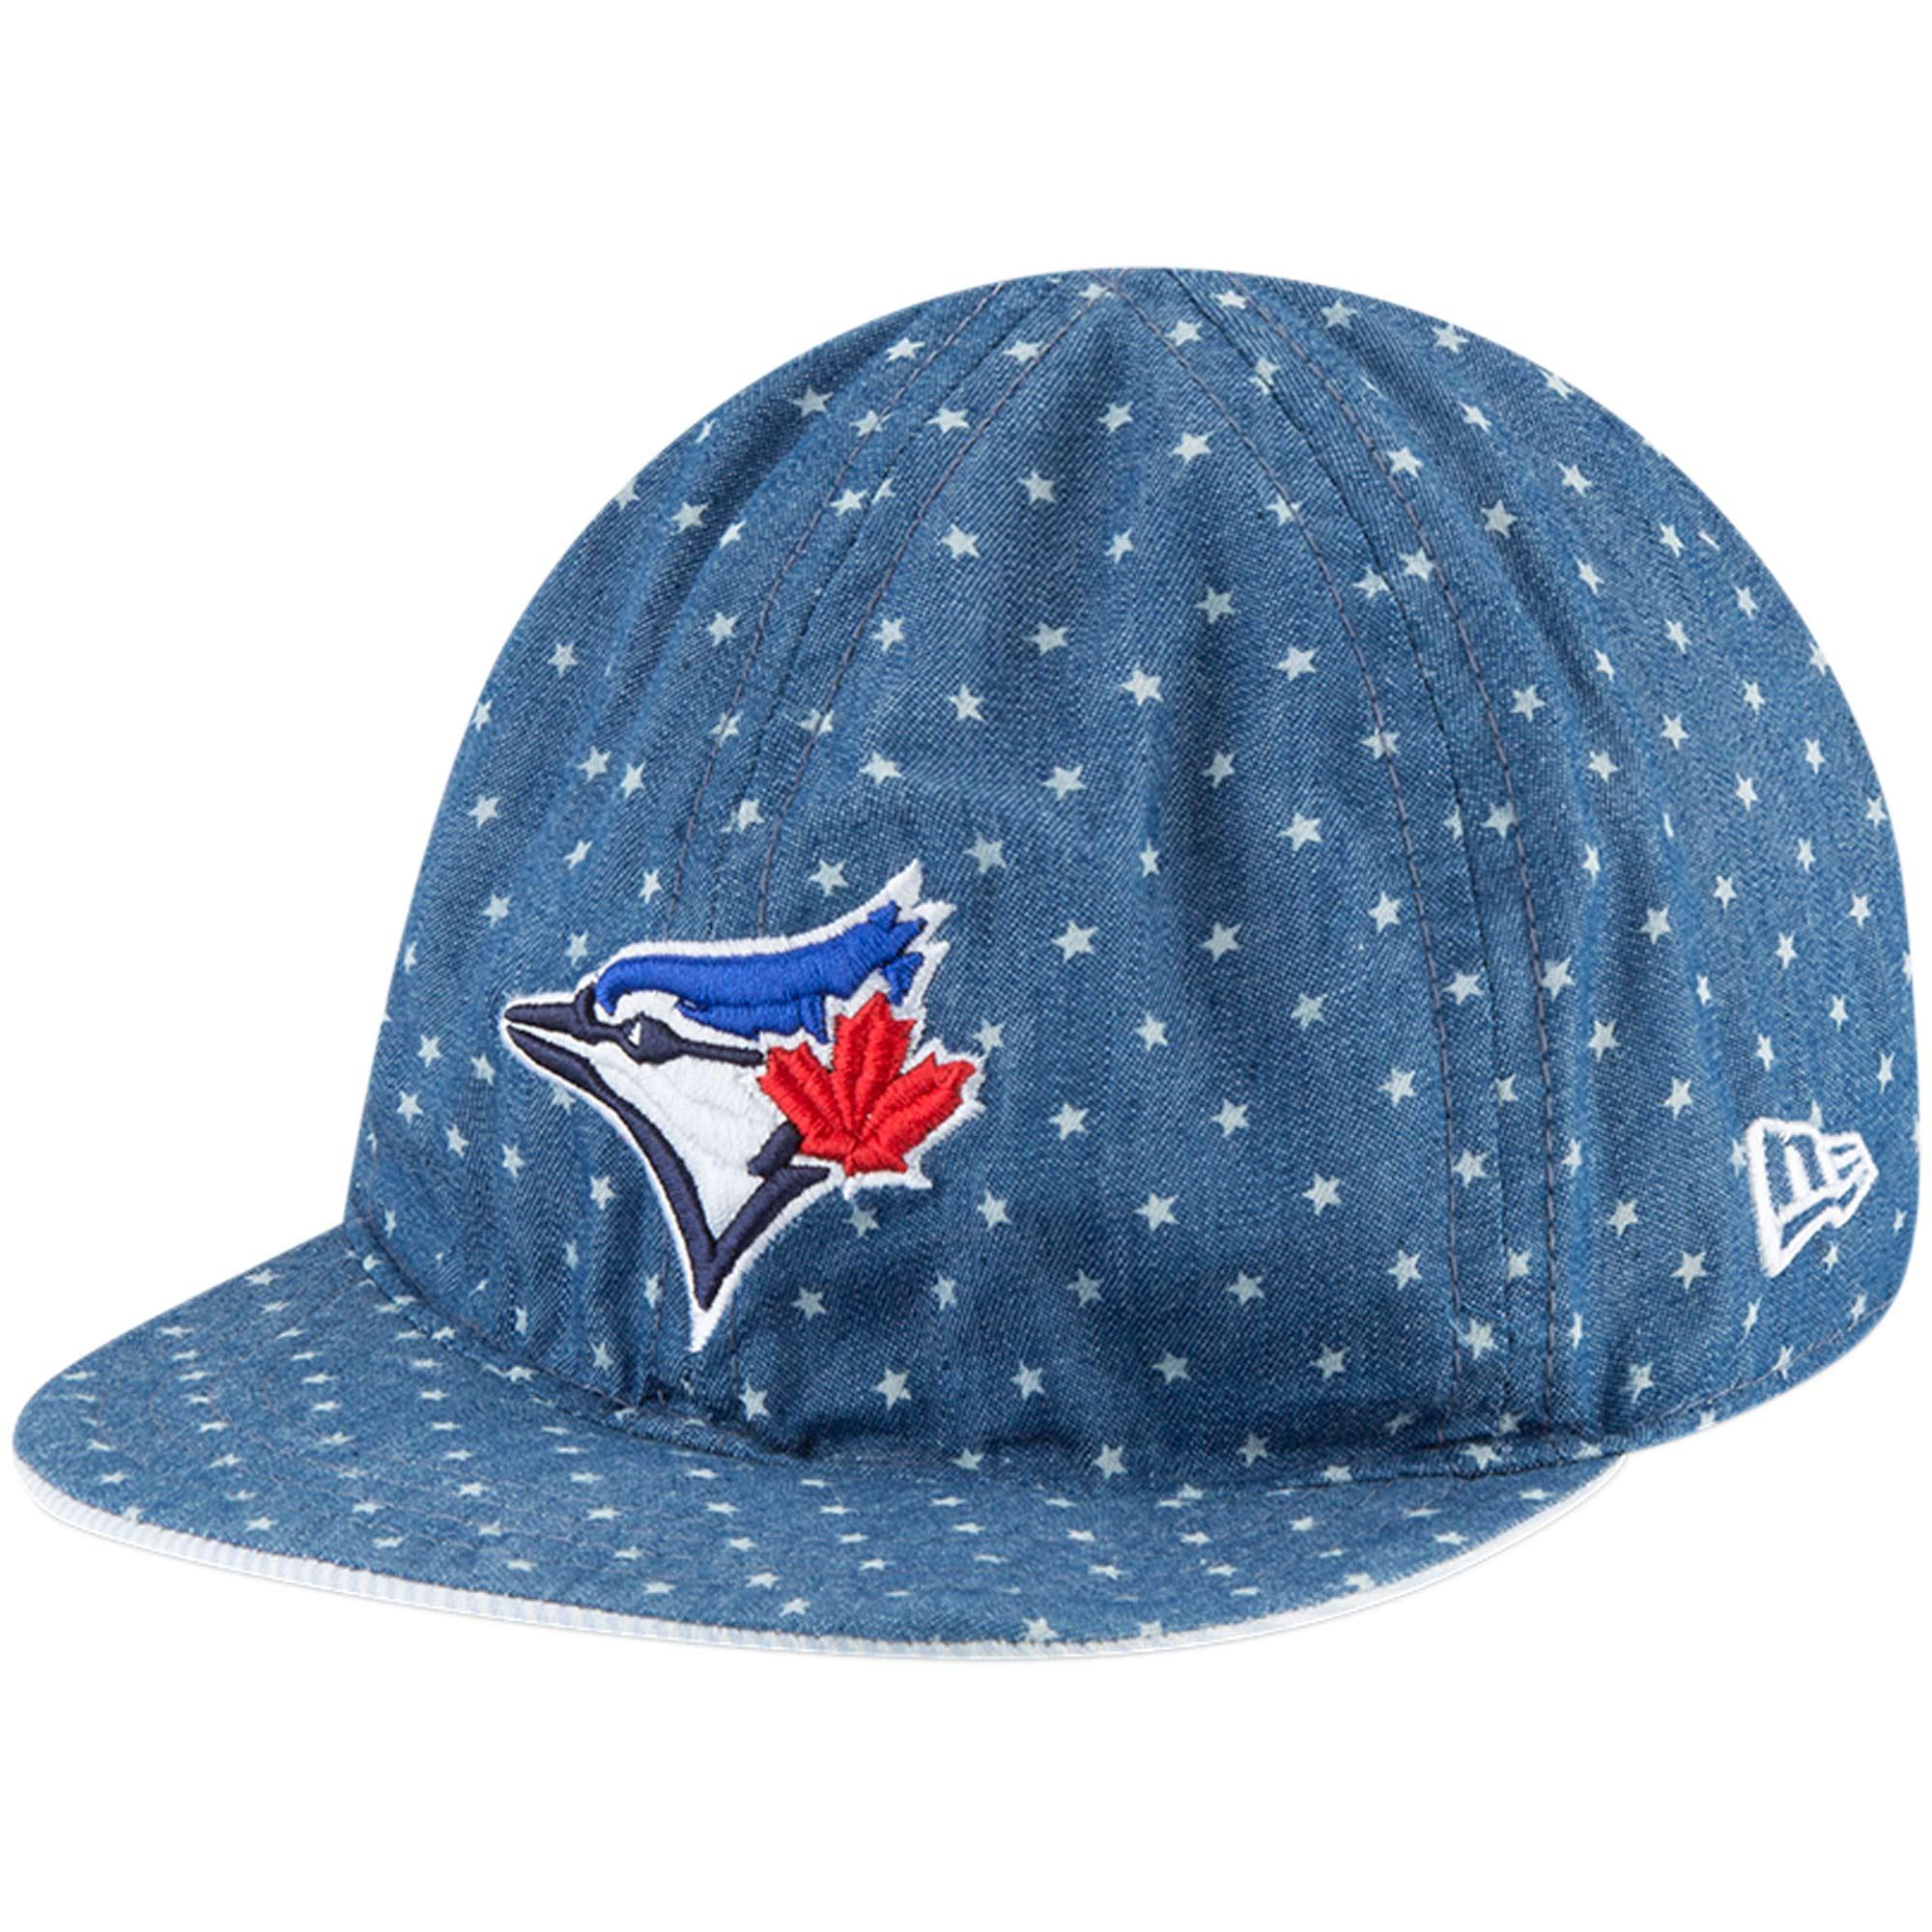 Toronto Blue Jays New Era Infant Flip 9TWENTY Adjustable Hat - Denim/White - OSFA